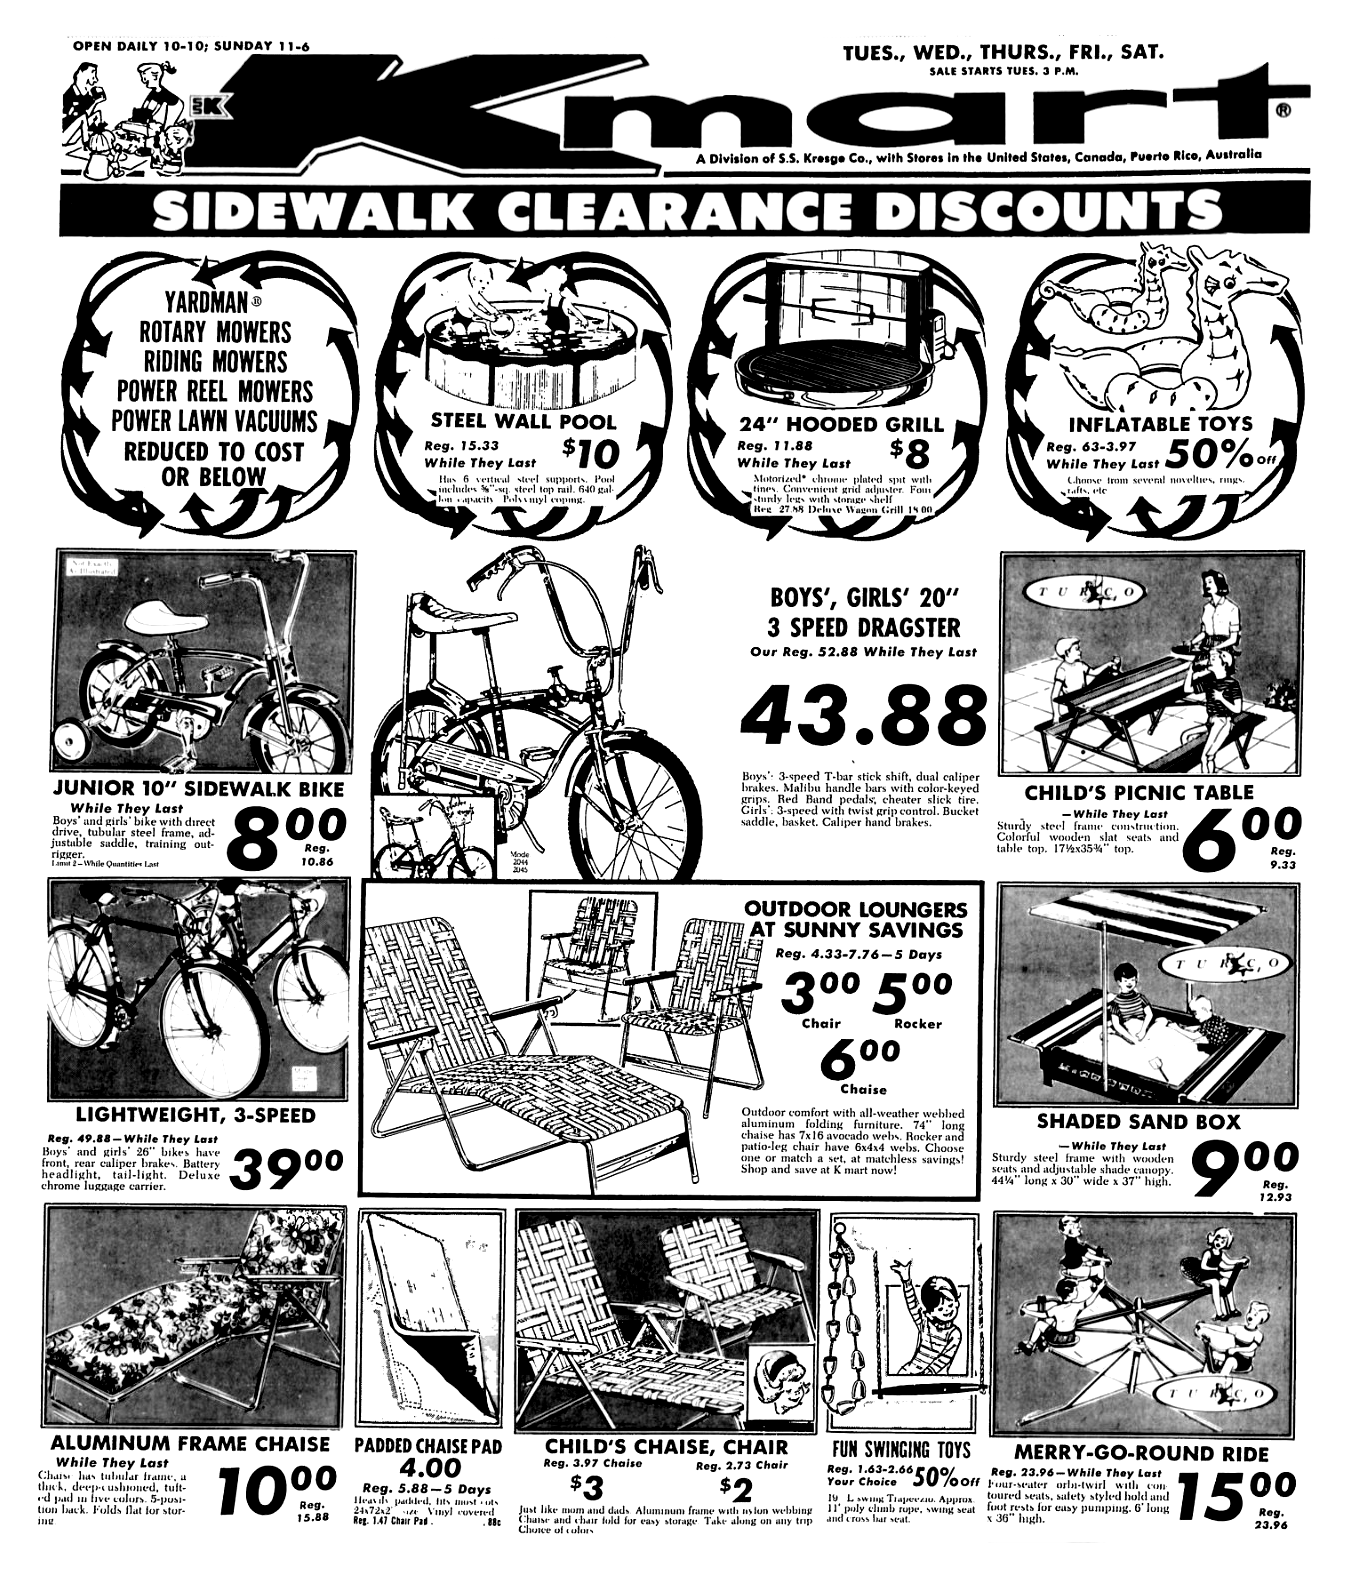 kmart sidewalk clearance august 1970 1970 s 1980 s newspaper 1980s Bicycle Ads kmart sidewalk clearance august 1970 newspaper advertisement advertising sidewalk 1980s retro